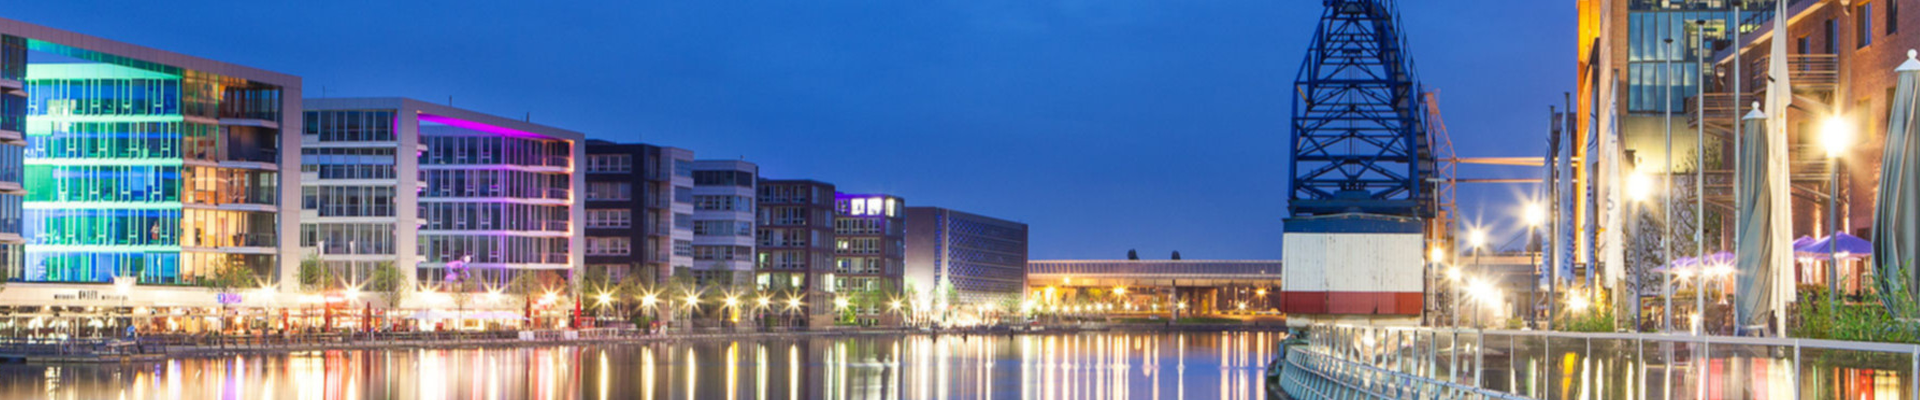 SEO Agentur Duisburg